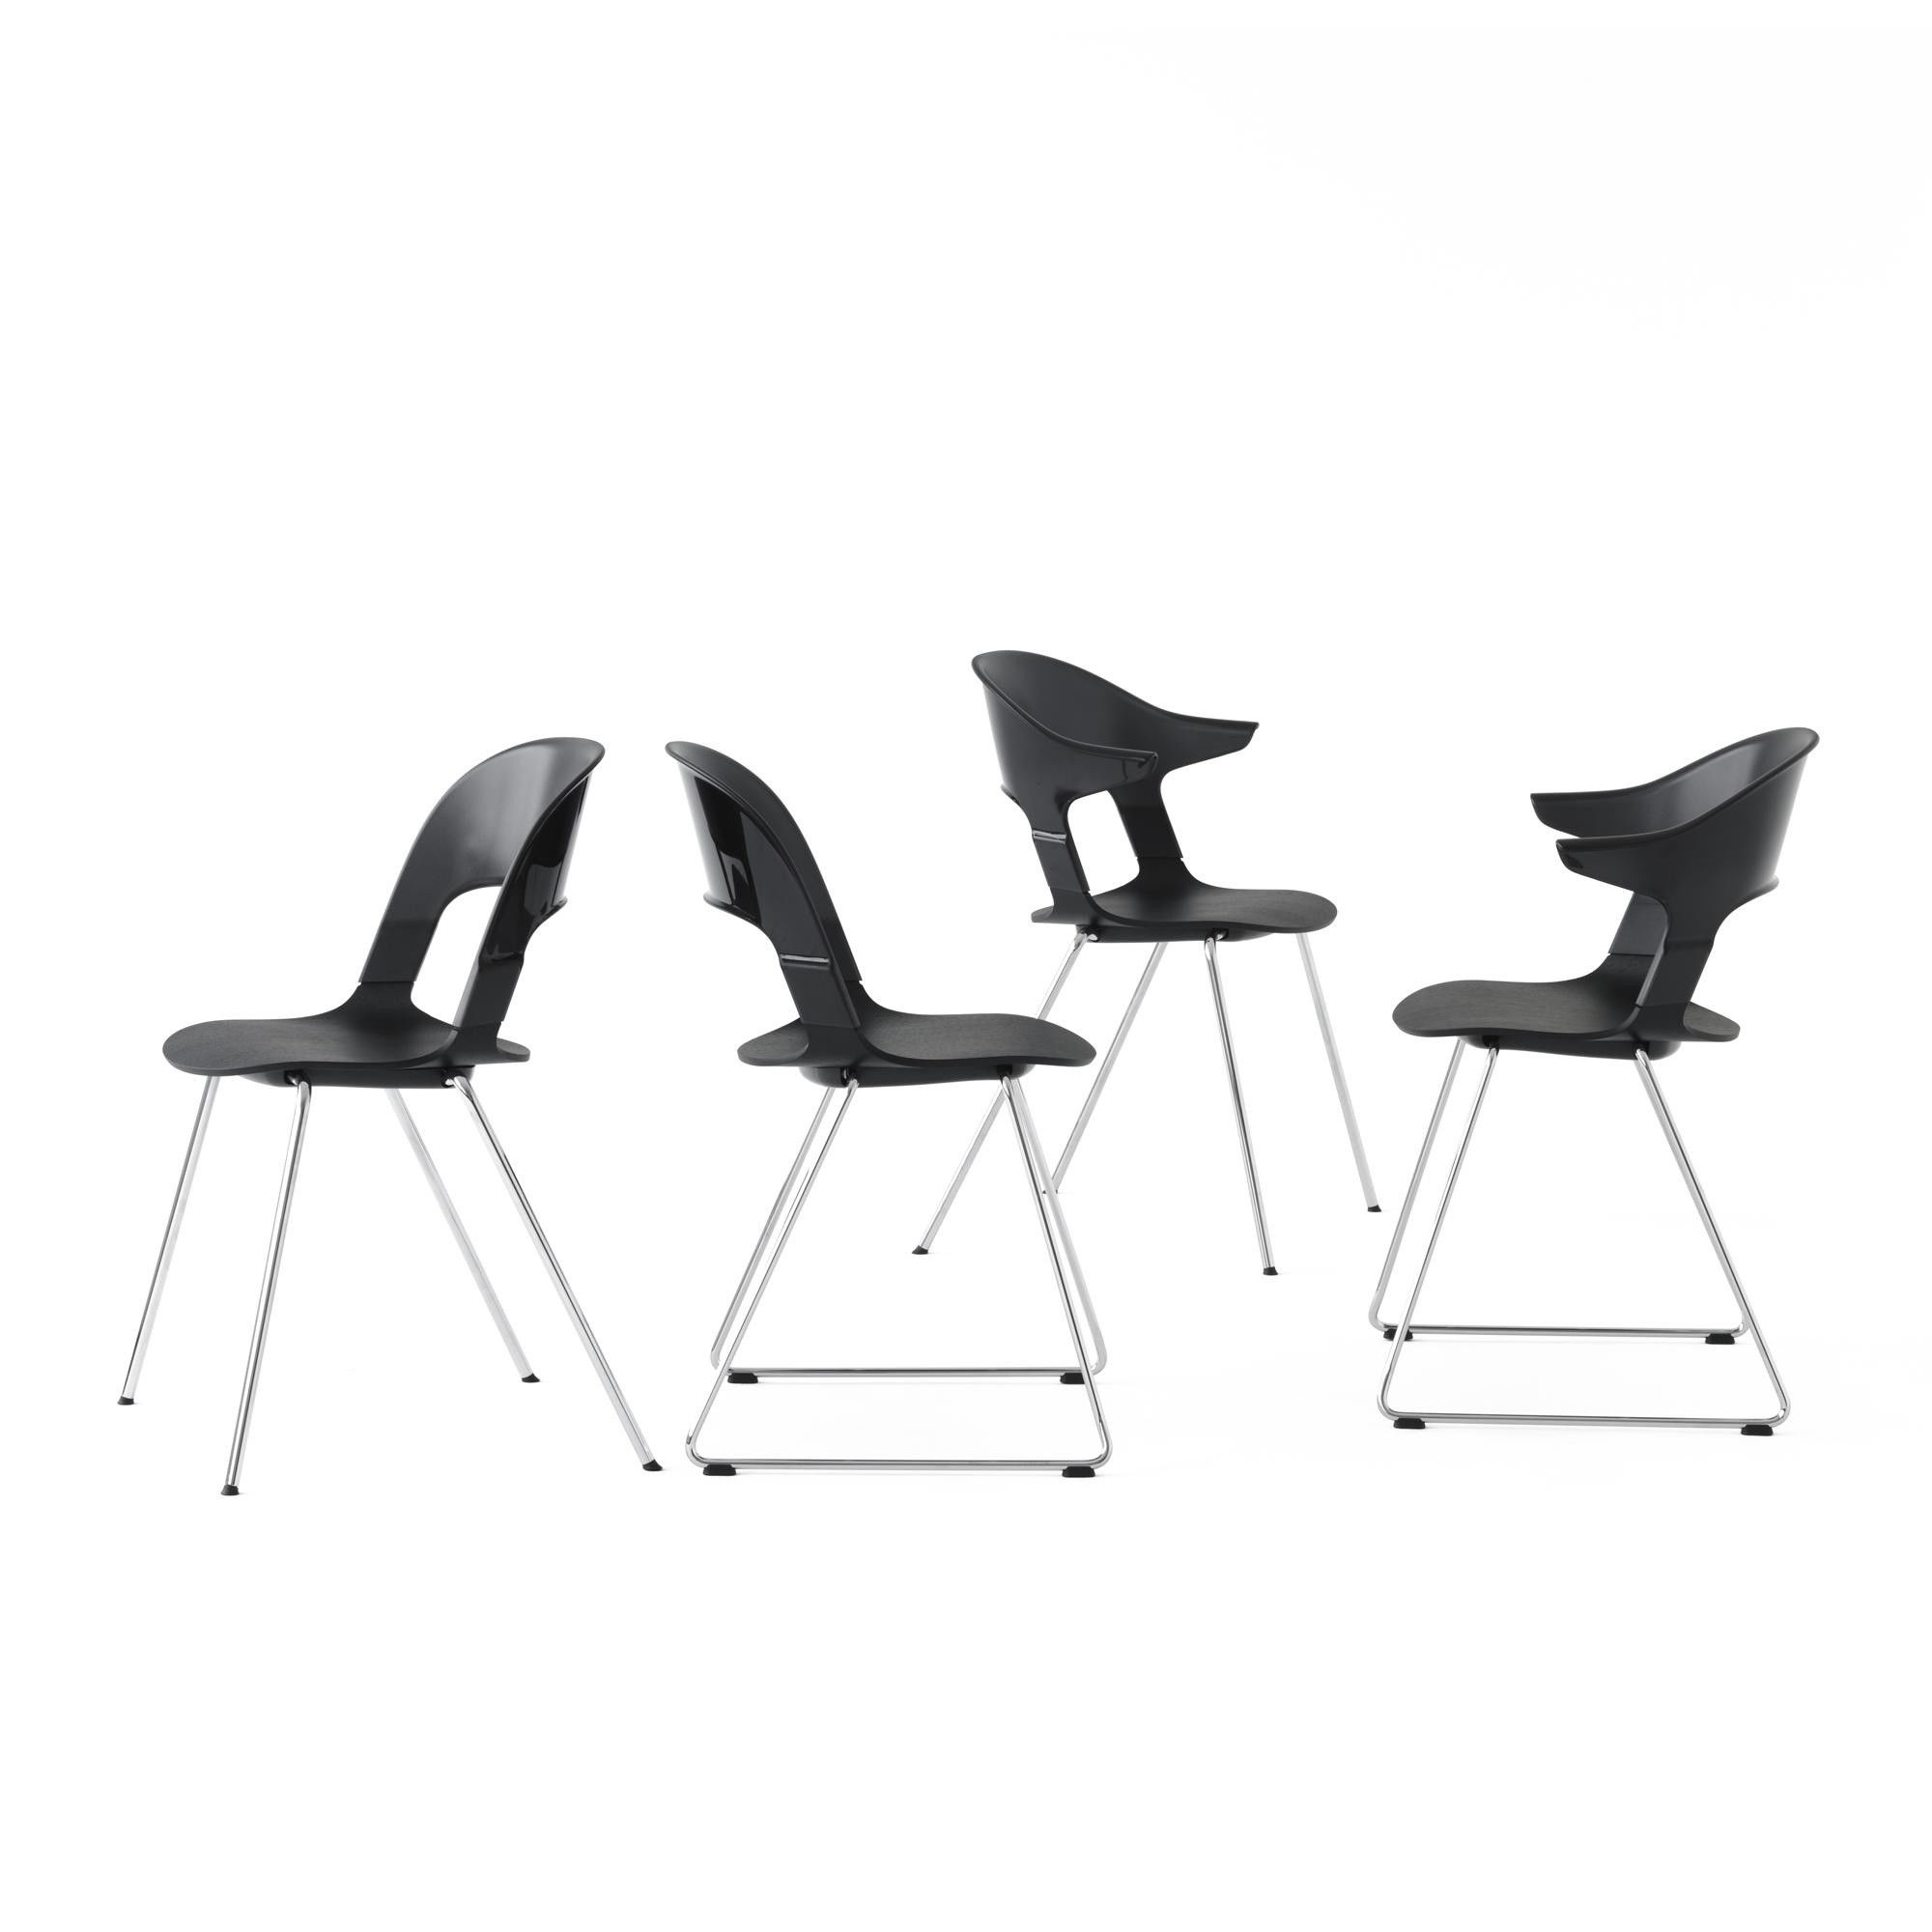 fritz hansen pair chair bh21 stuhl ambientedirect. Black Bedroom Furniture Sets. Home Design Ideas